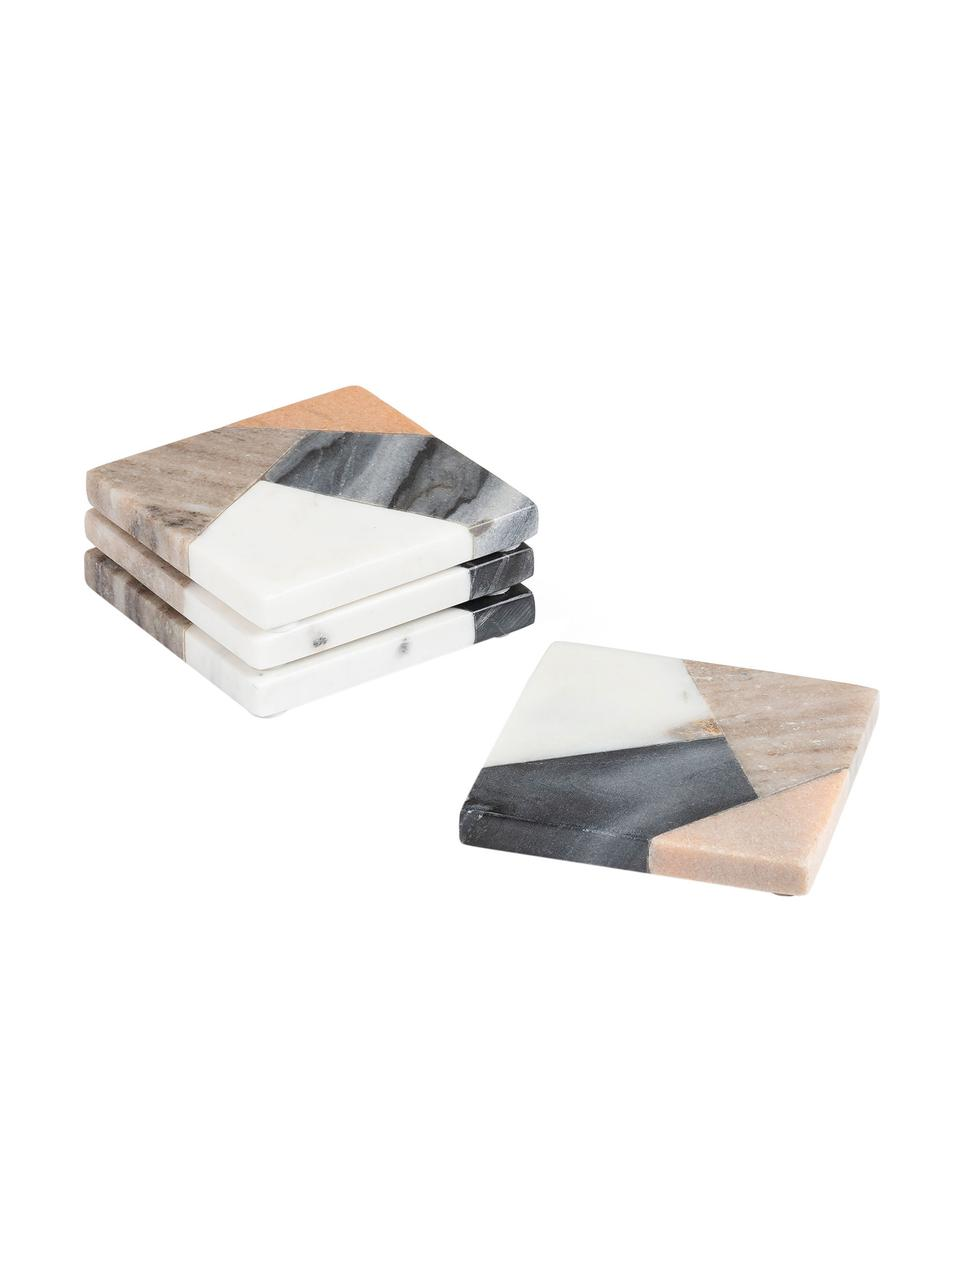 Eckige Marmor-Untersetzer Bradney, 4 Stück, Keramik, Marmor, Mehrfarbig, B 10 x T 10 cm